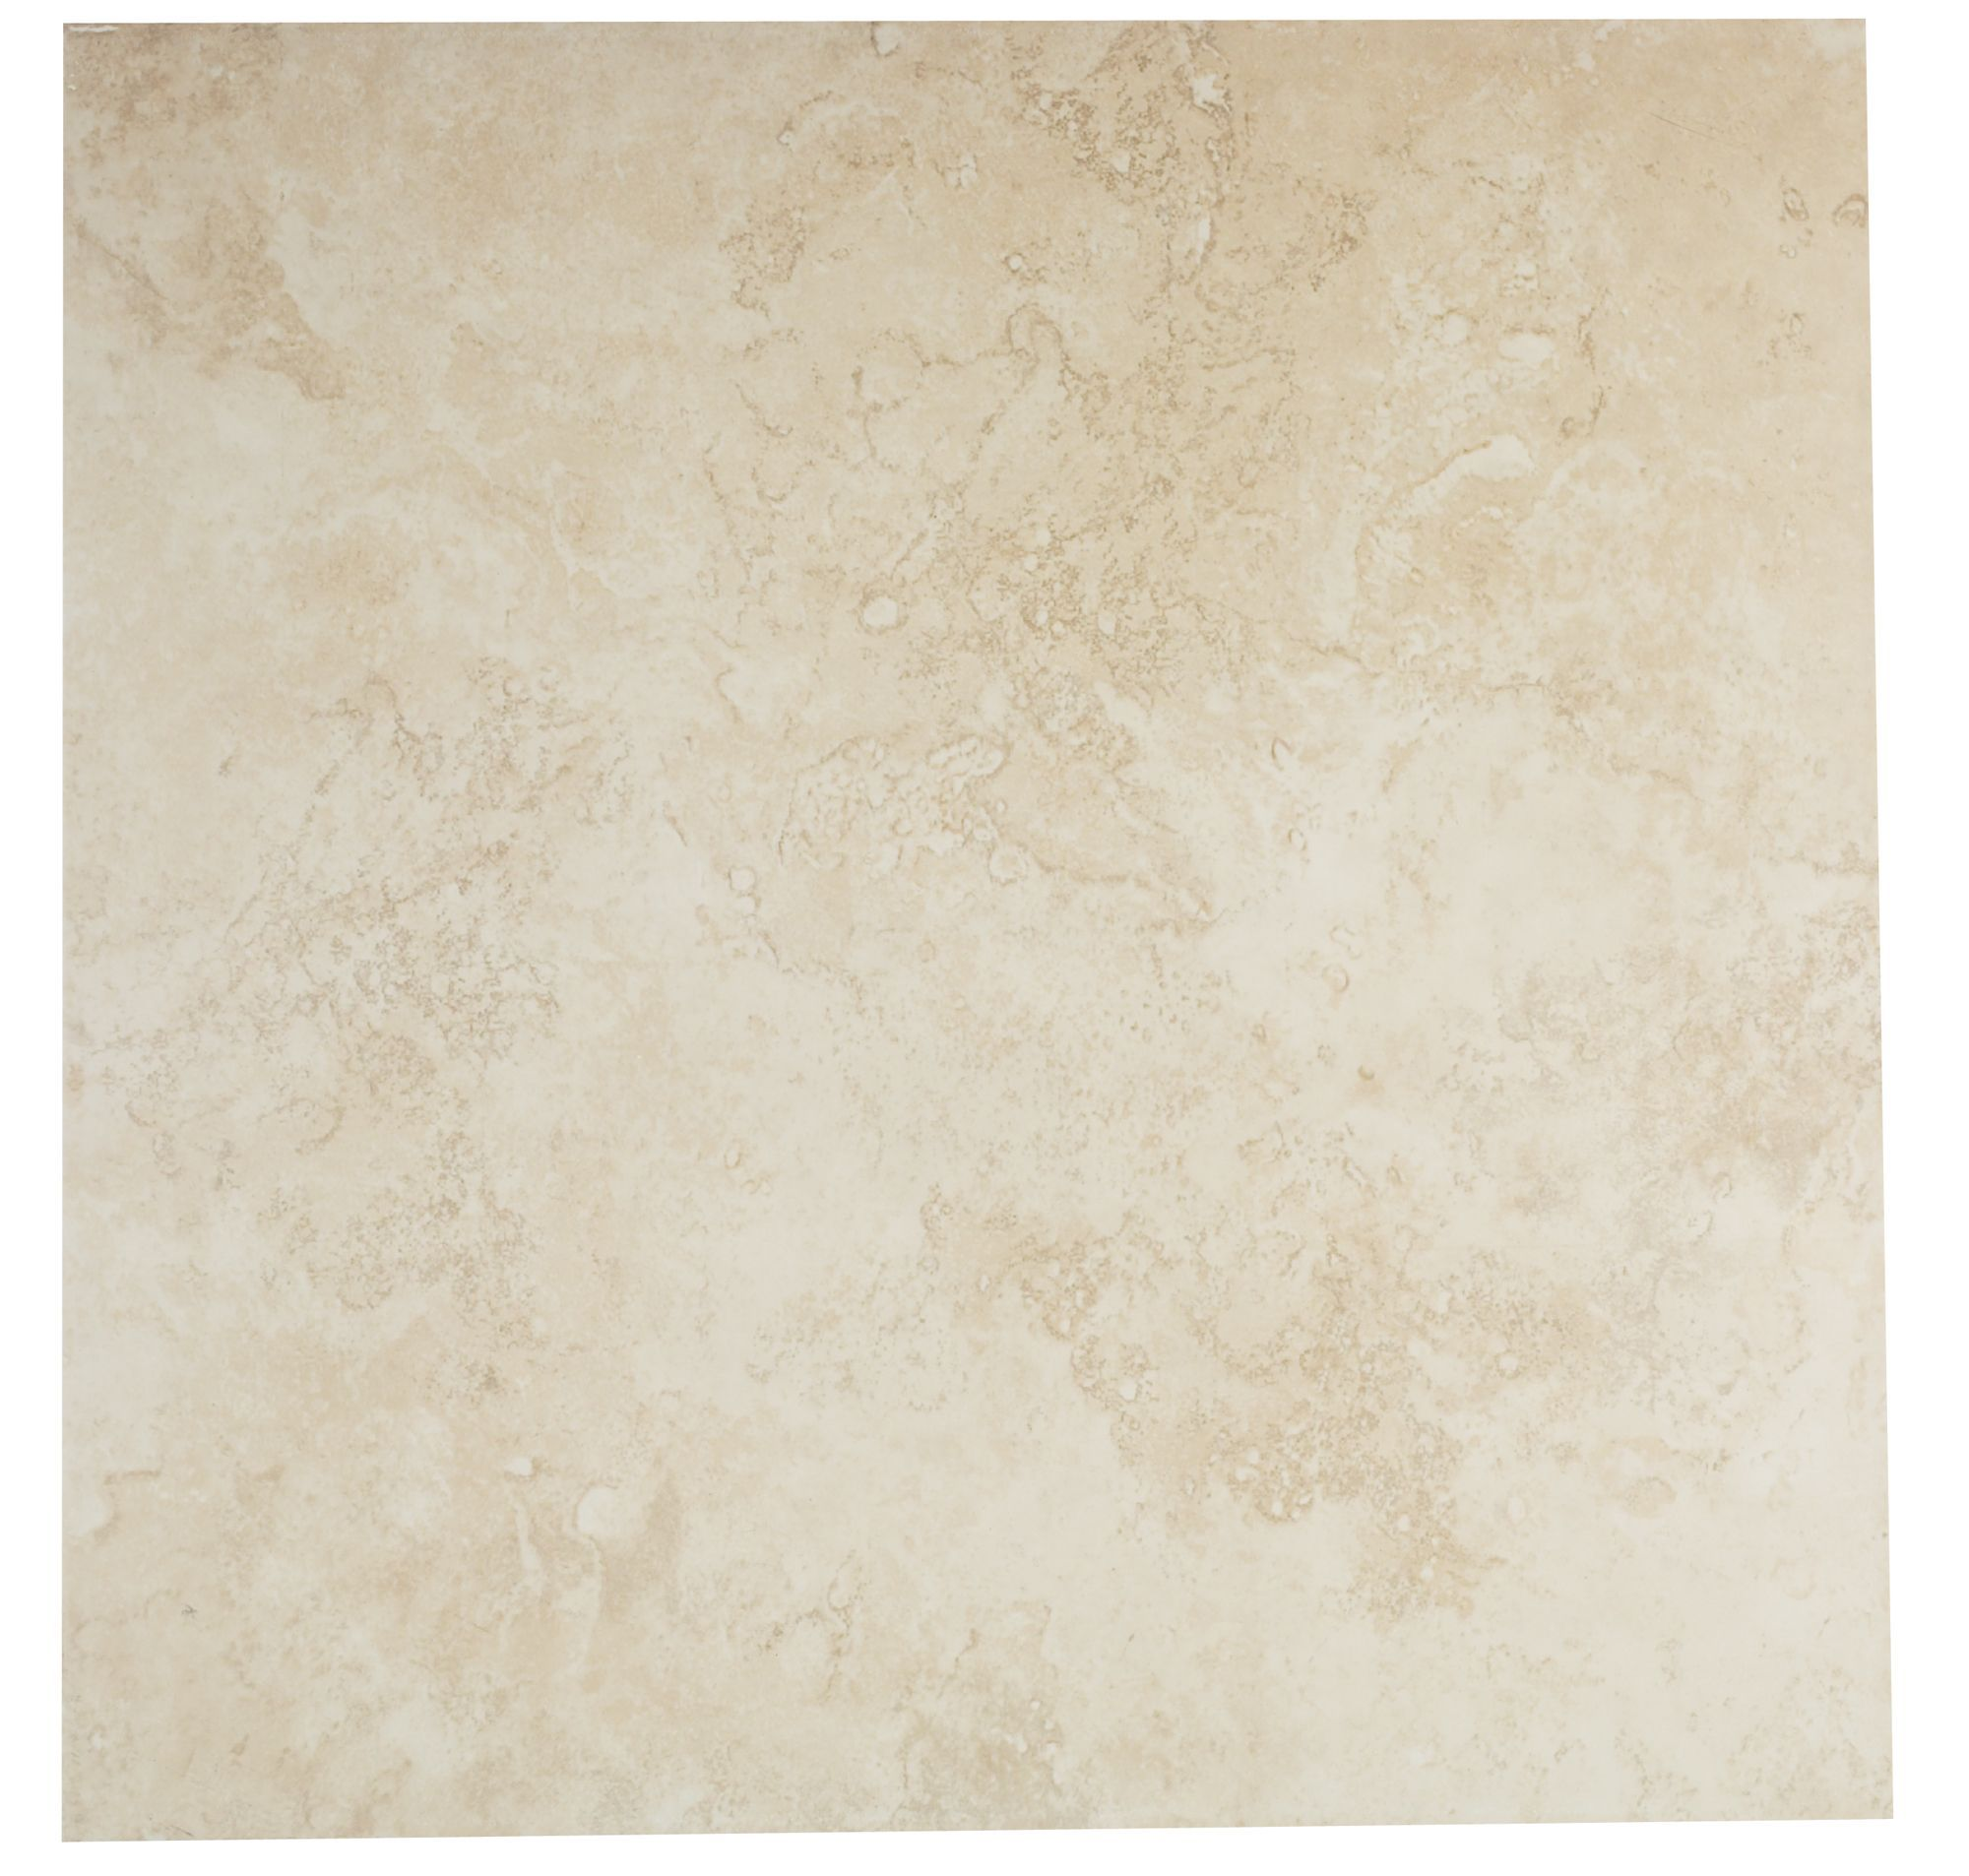 castle travertine cream ceramic wall & floor tile, pack of 5, (l